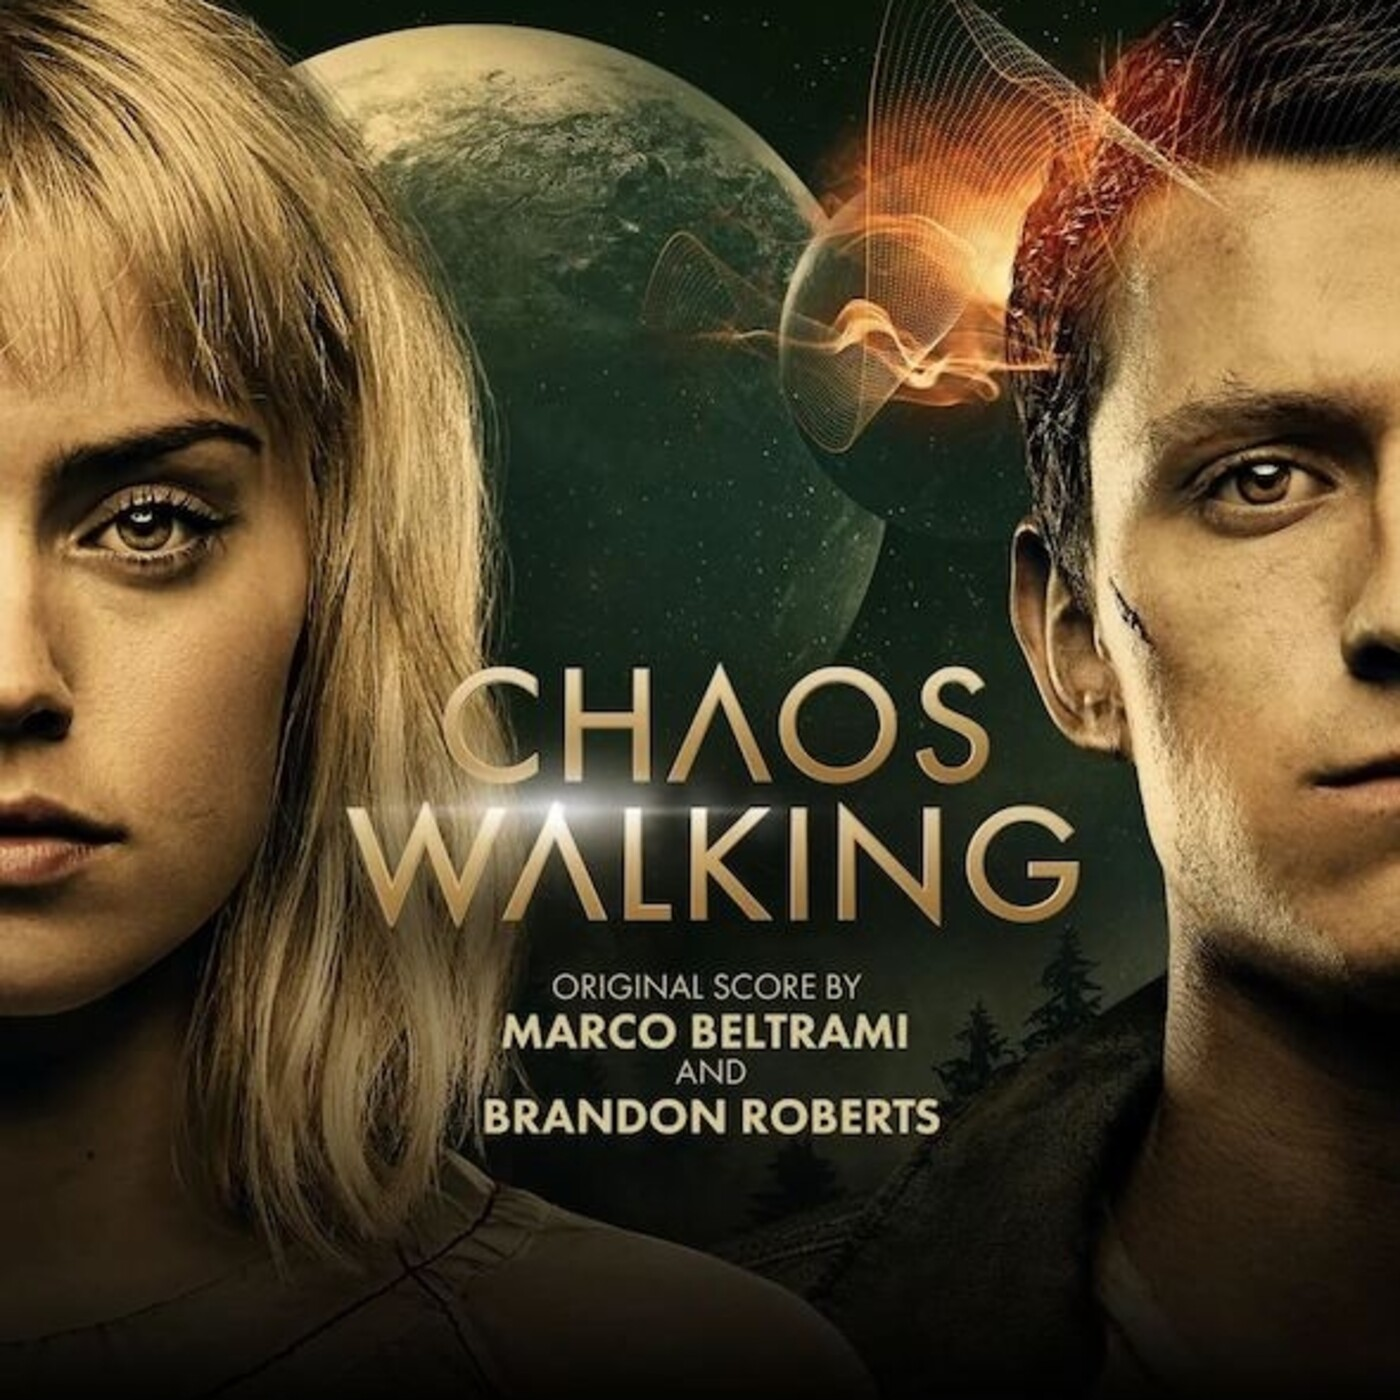 Rtfm 4x03 : Chaos Walking + De amor y monstruos